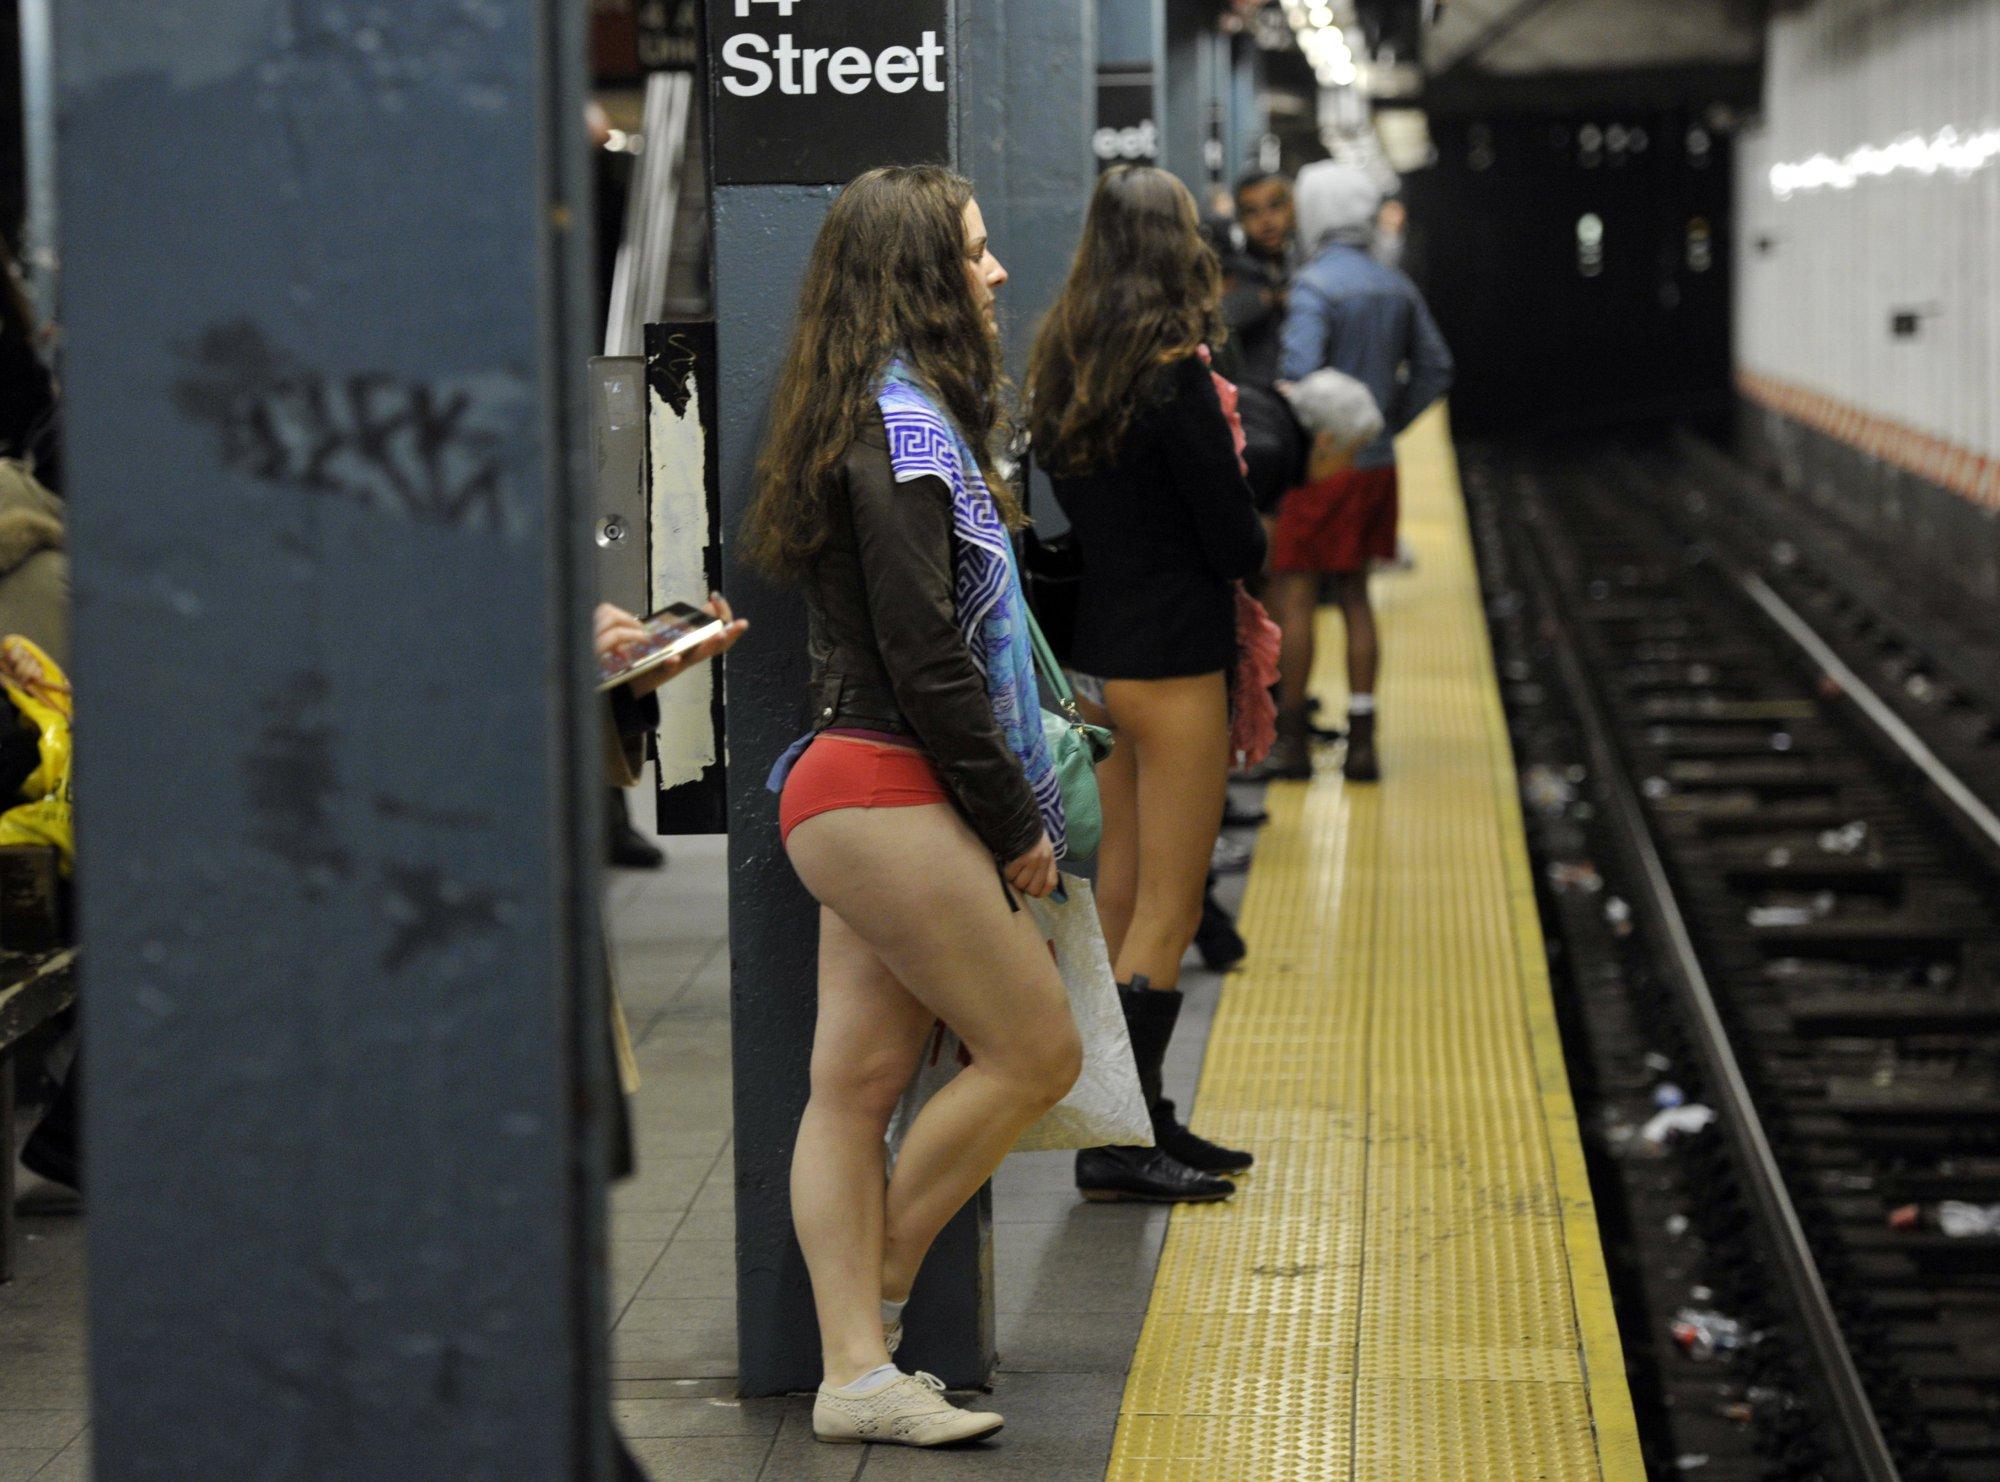 Фото под юбкаи в метро 9 фотография